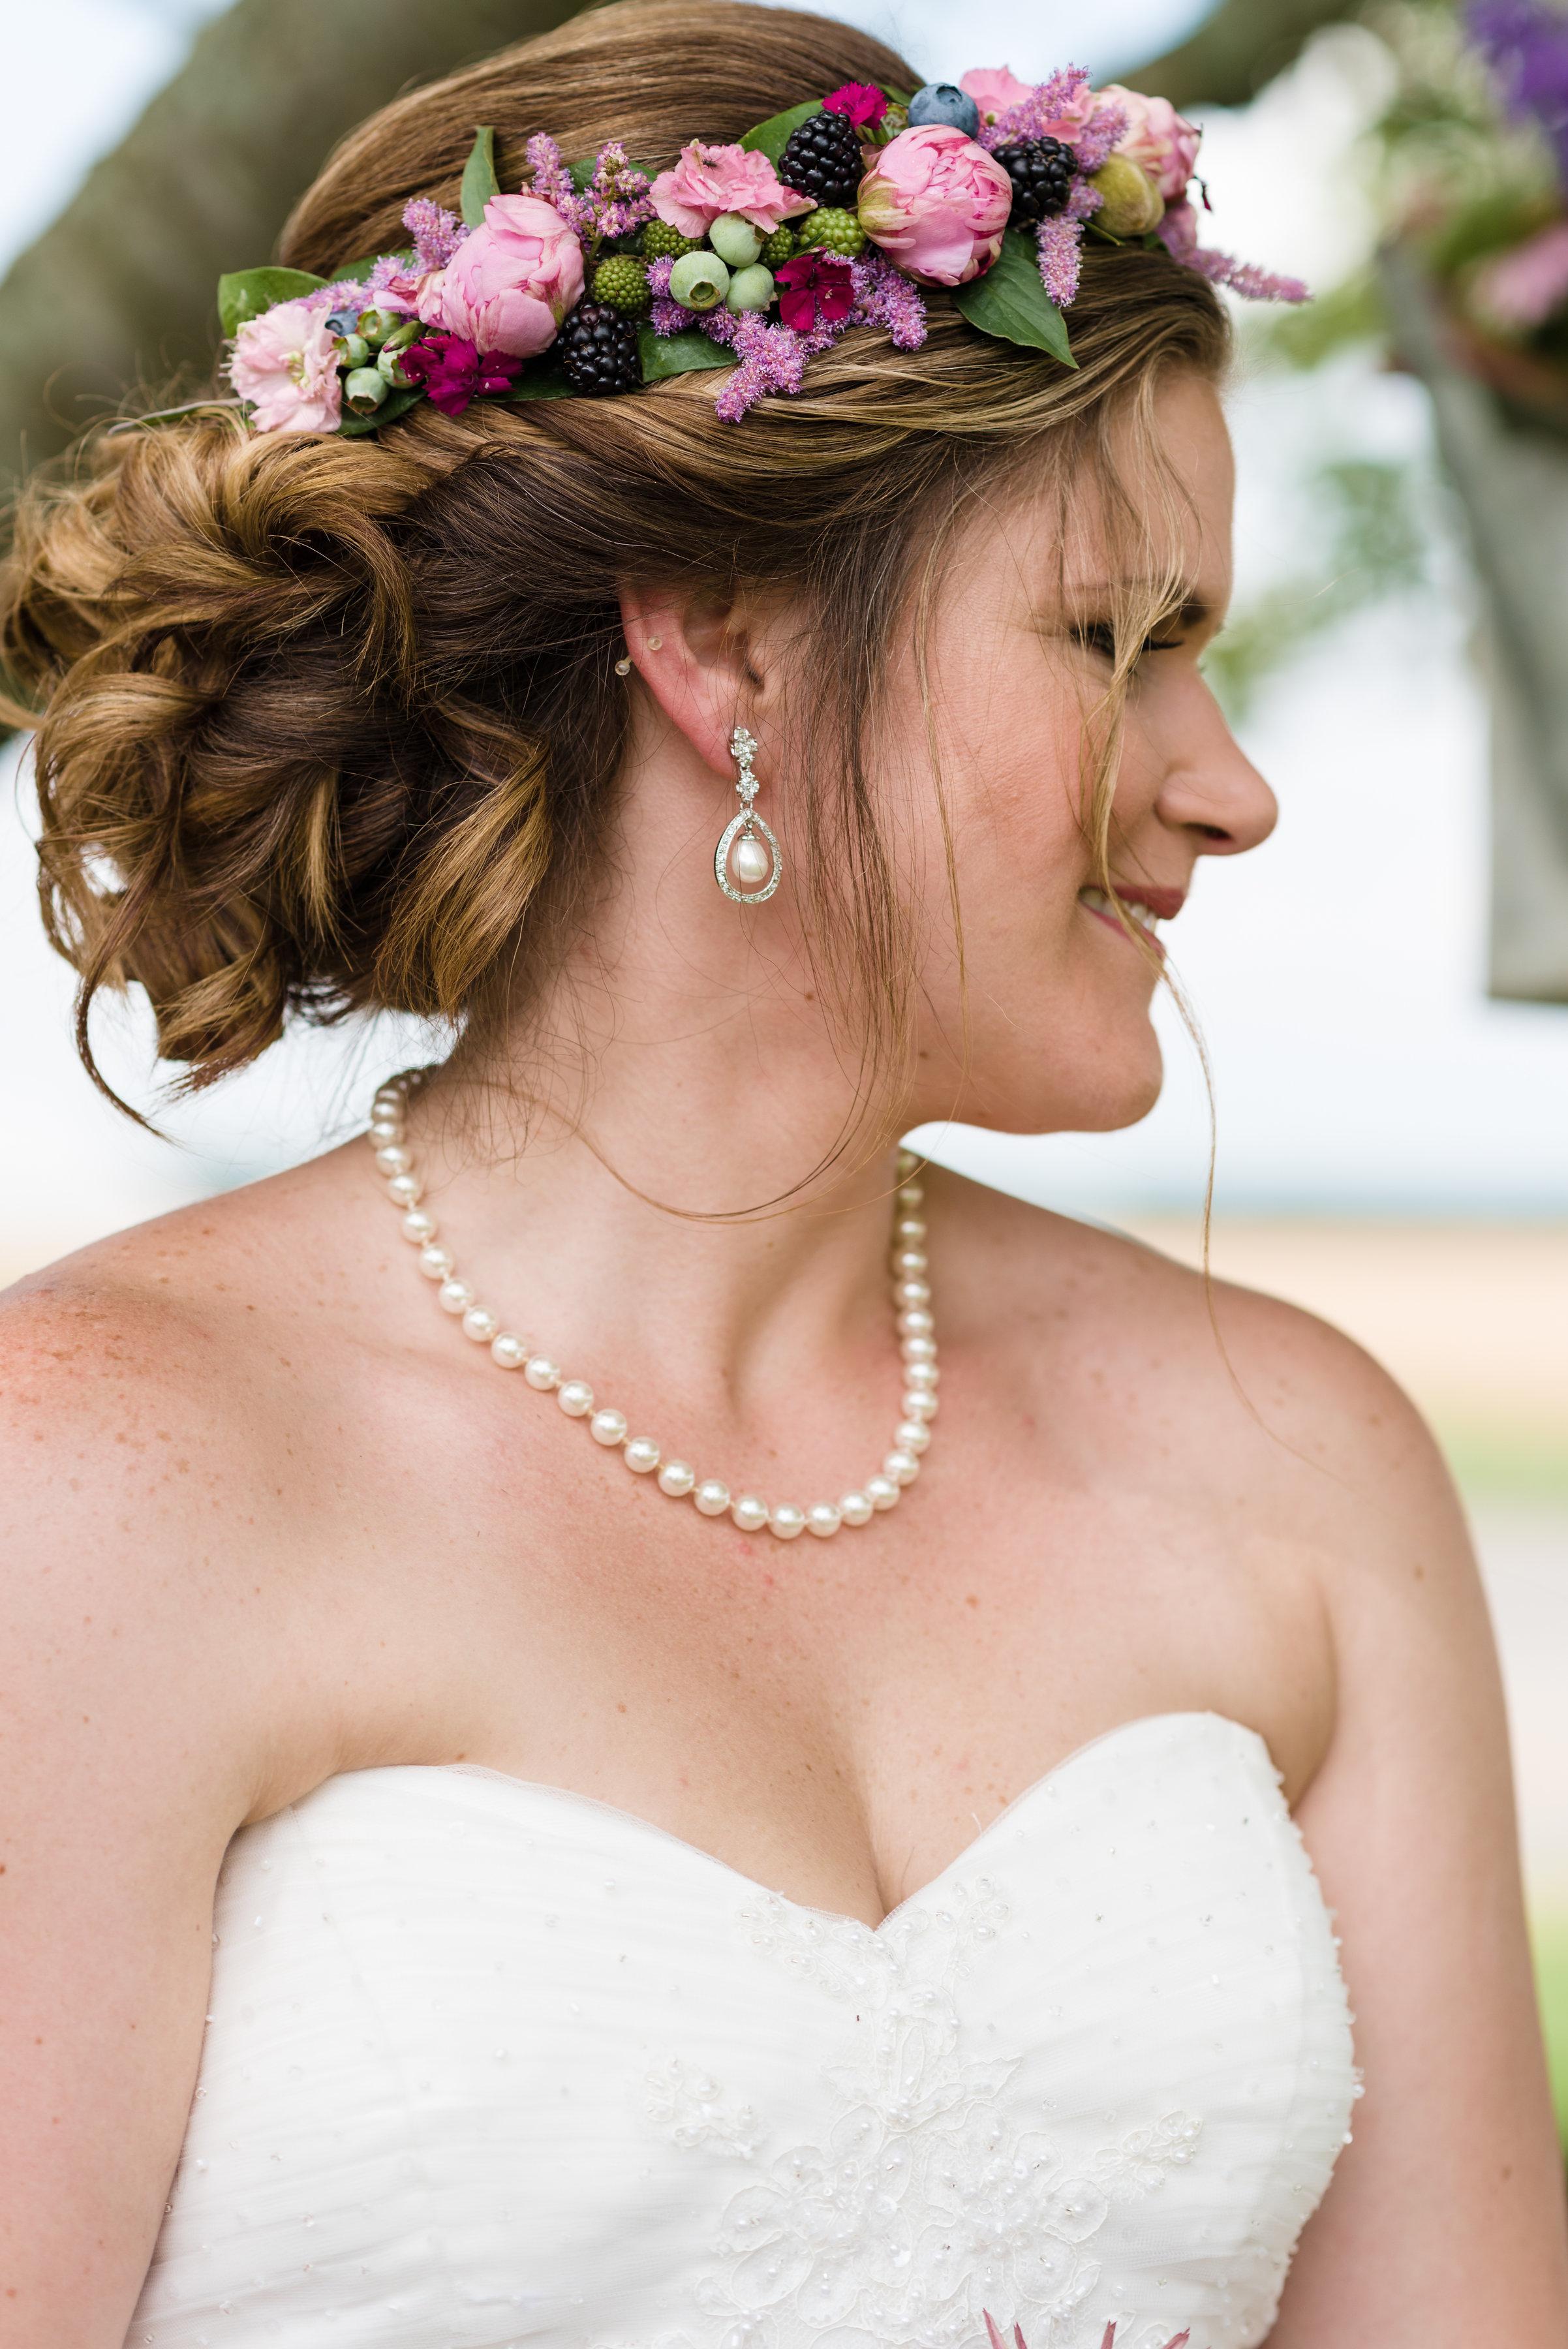 Copy of Mandy-secondshooter-south-jersey-wedding-photography-love-story-studios-0034.jpg